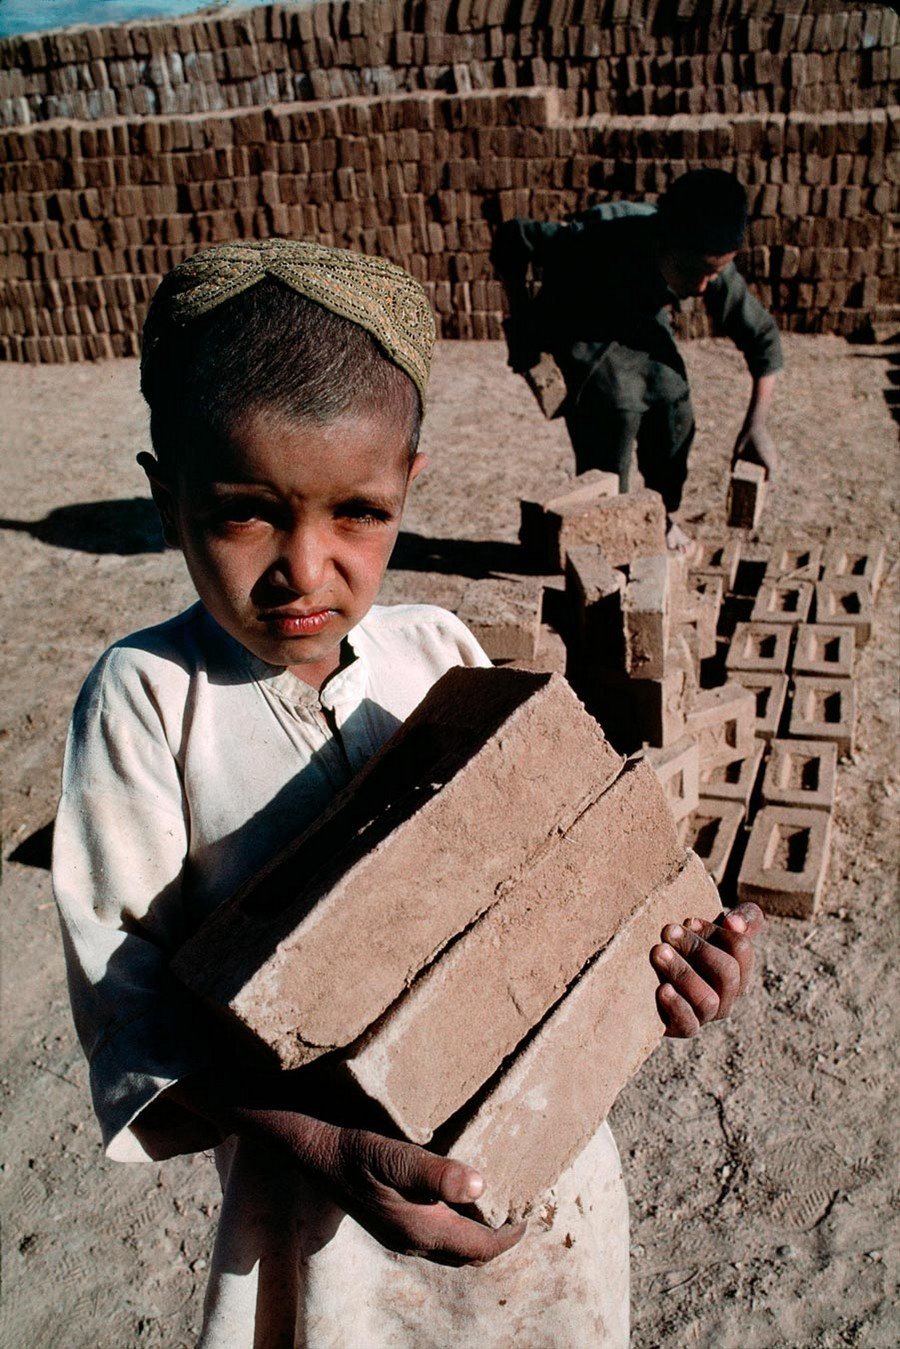 a paper on child labor